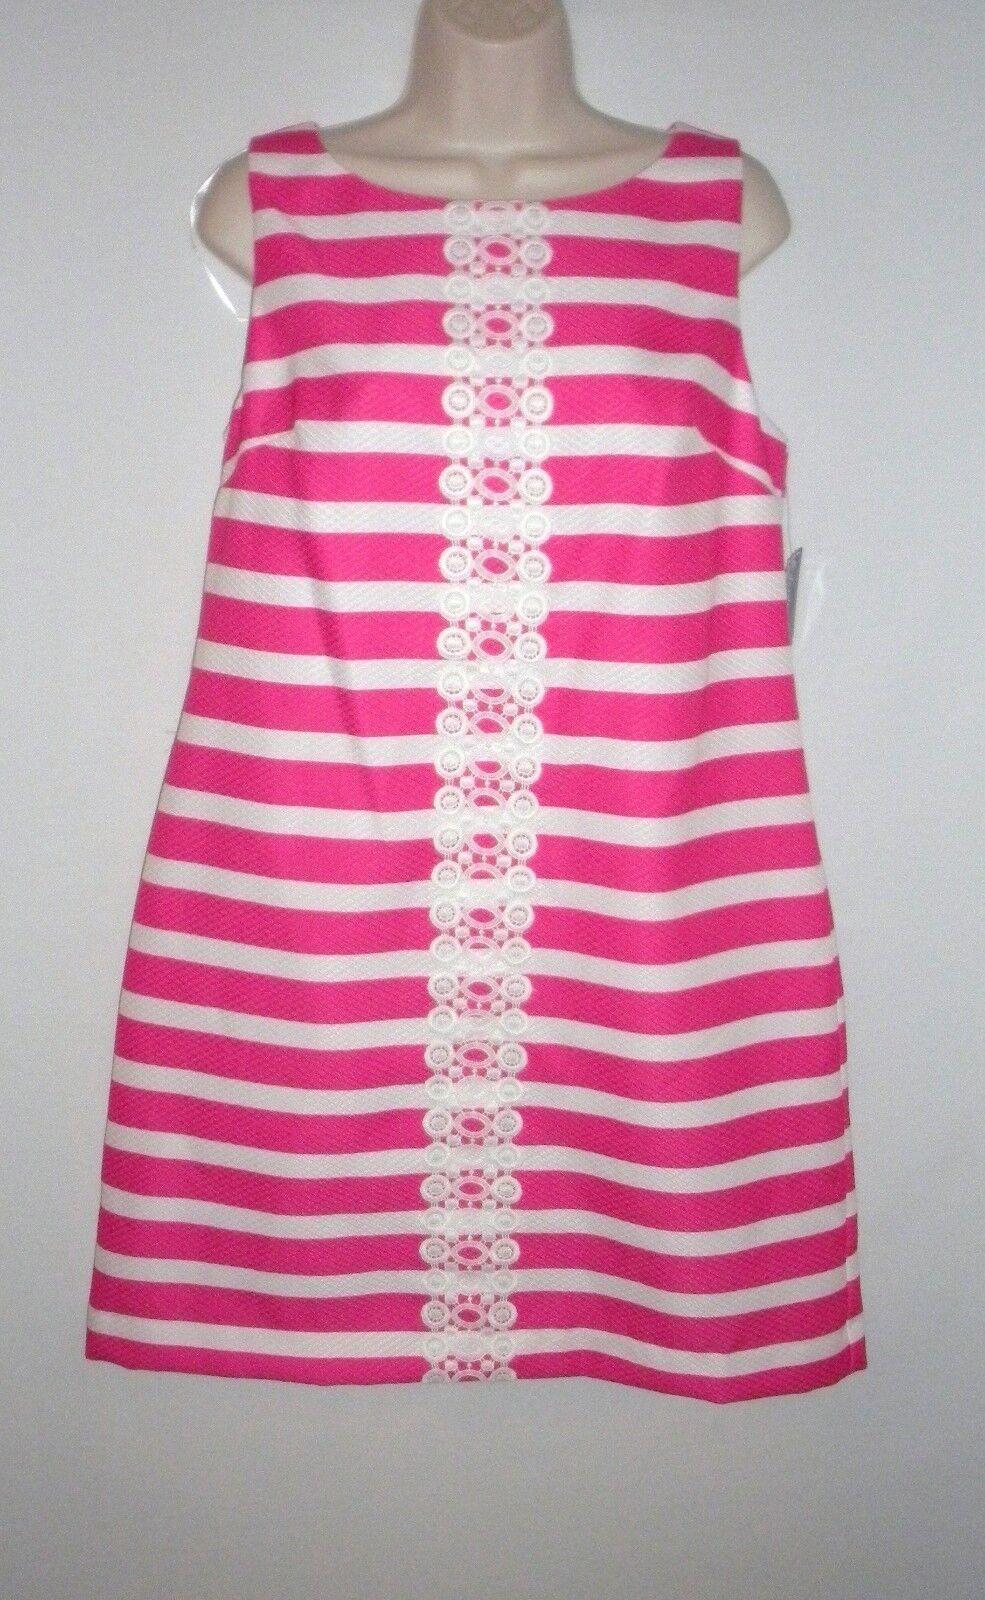 NEW  100 JESSICA HOWARD Fuchsia Pink & White Lace Panel Shift Dress, Plus 14W